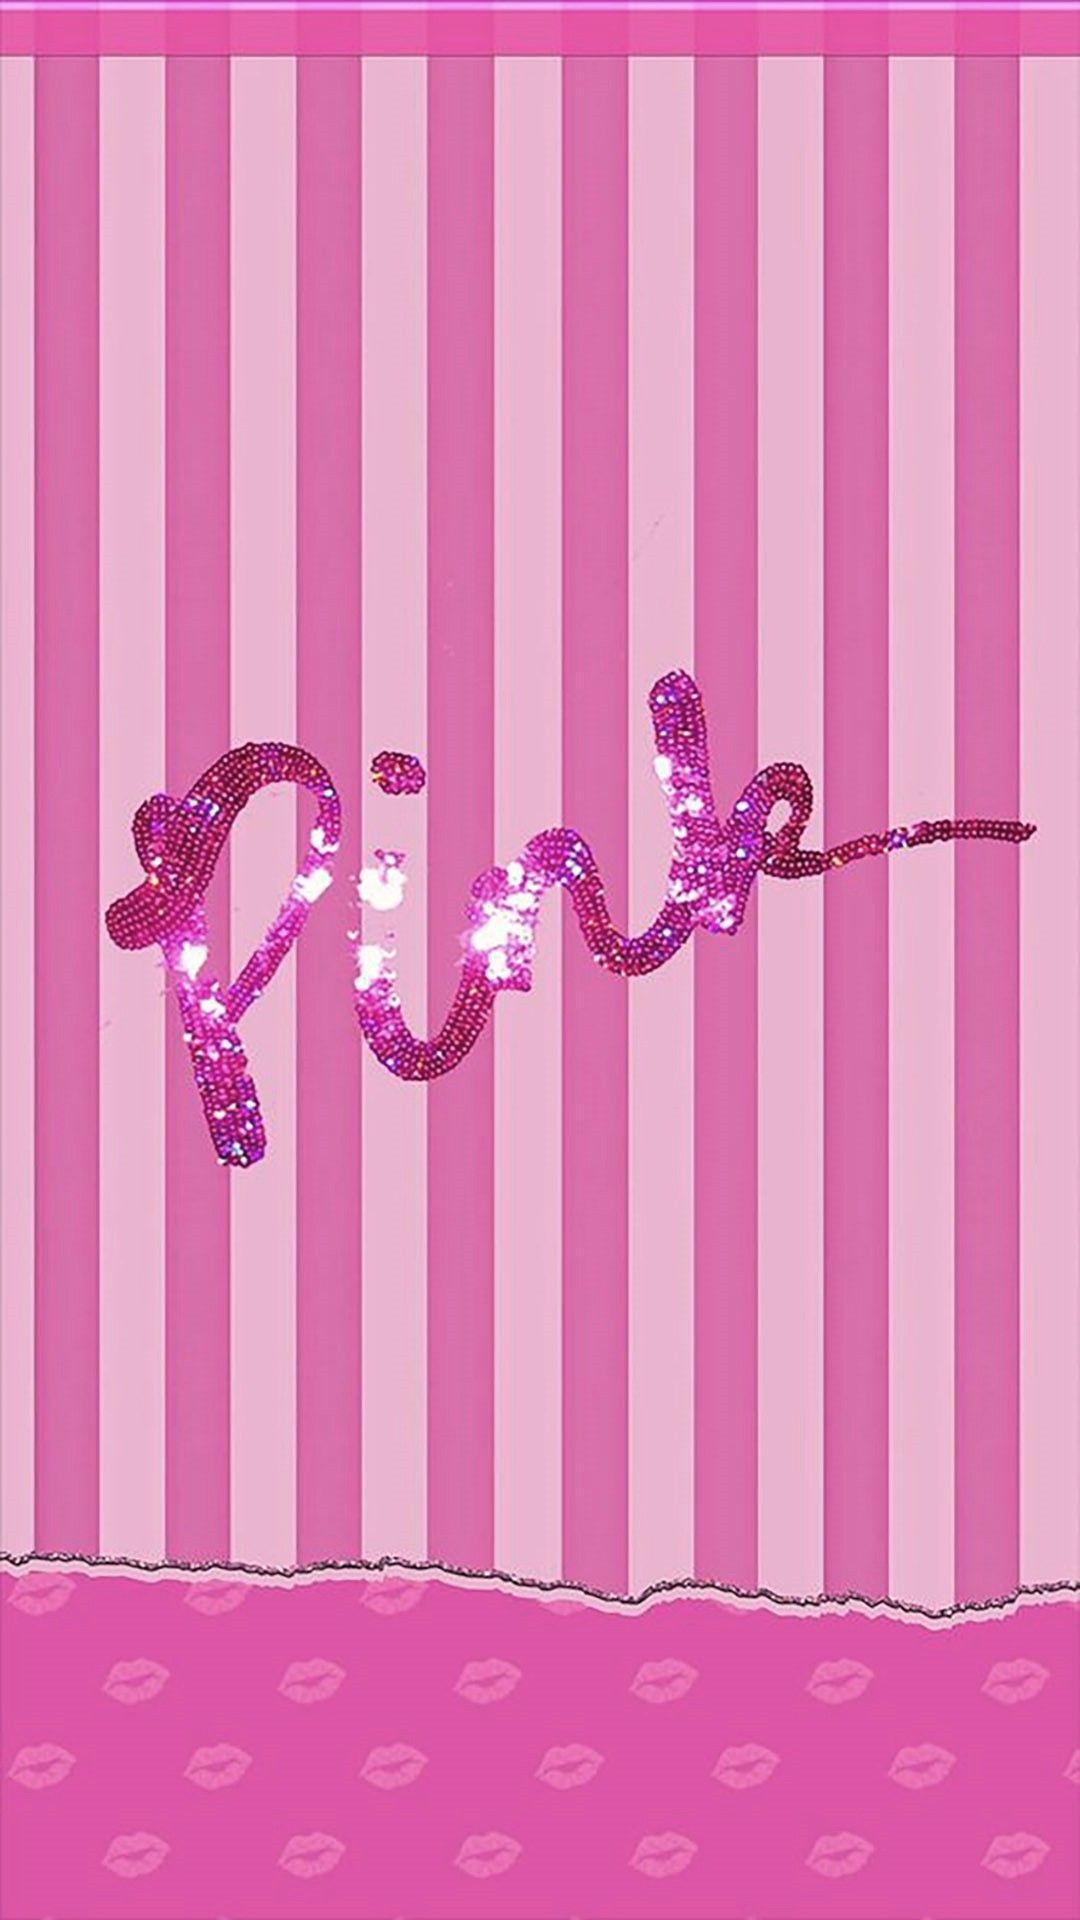 Pink おしゃれまとめの人気アイデア Pinterest Anna Hirano おしゃれな壁紙背景 壁紙 おしゃれな壁紙